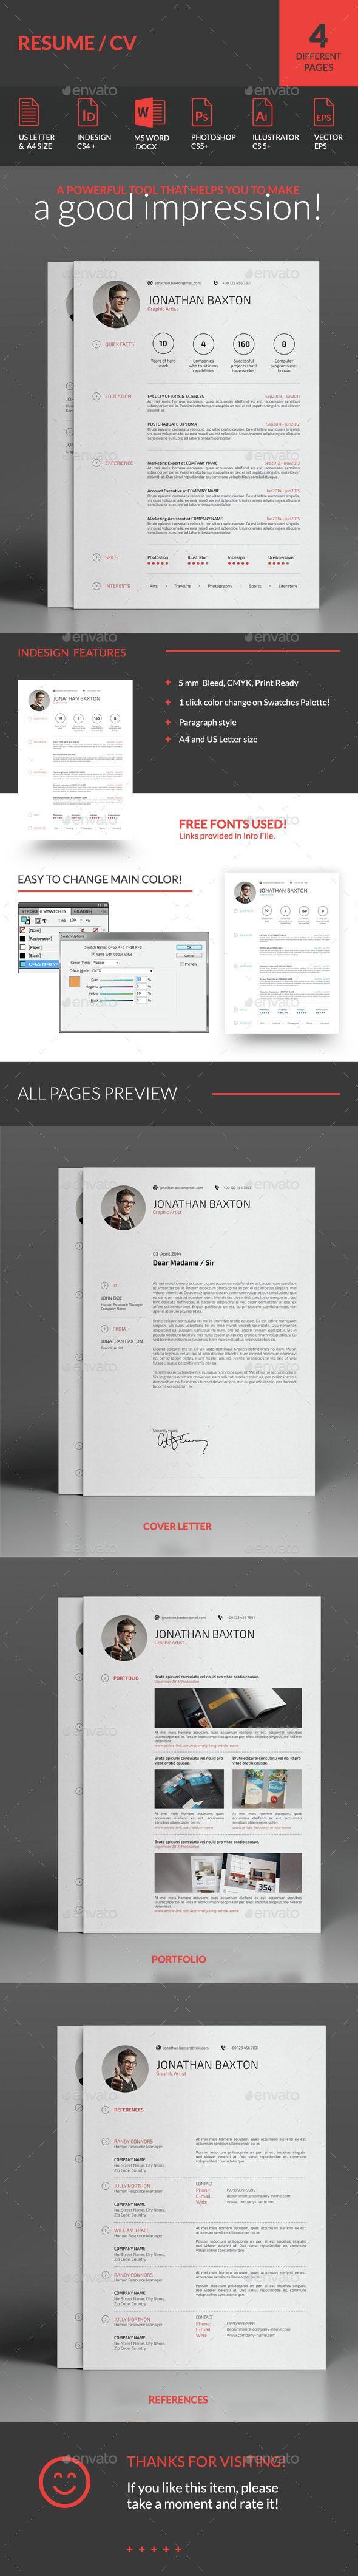 #Clean & Simple Resume.Download here: http://graphicriver.net/item/resume-cv/7398472?ref=arroganttype